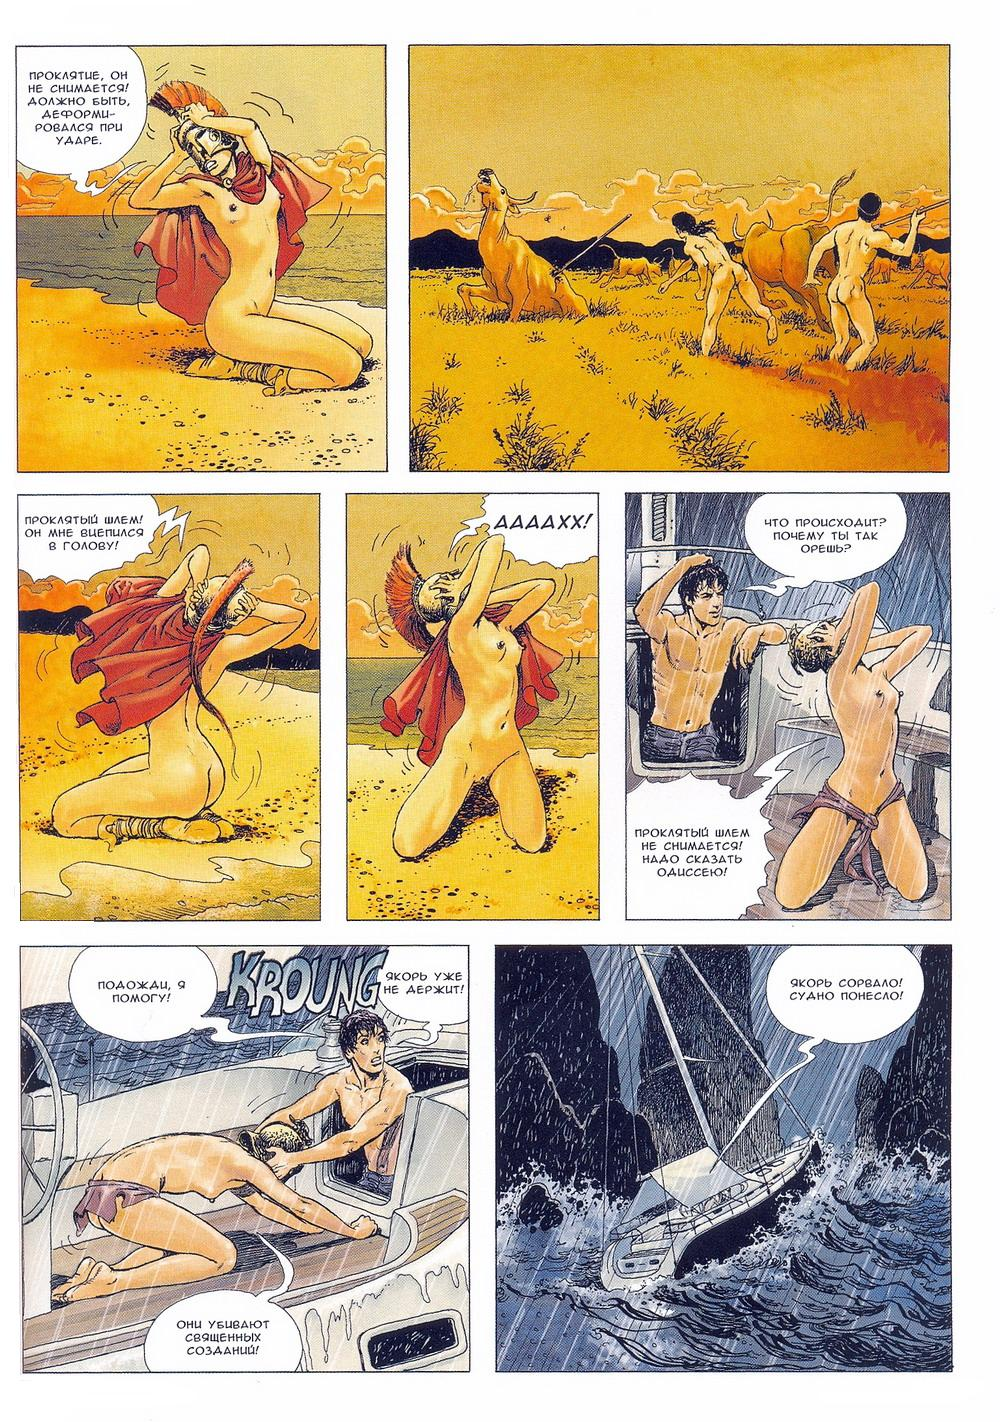 porno-komiks-manara